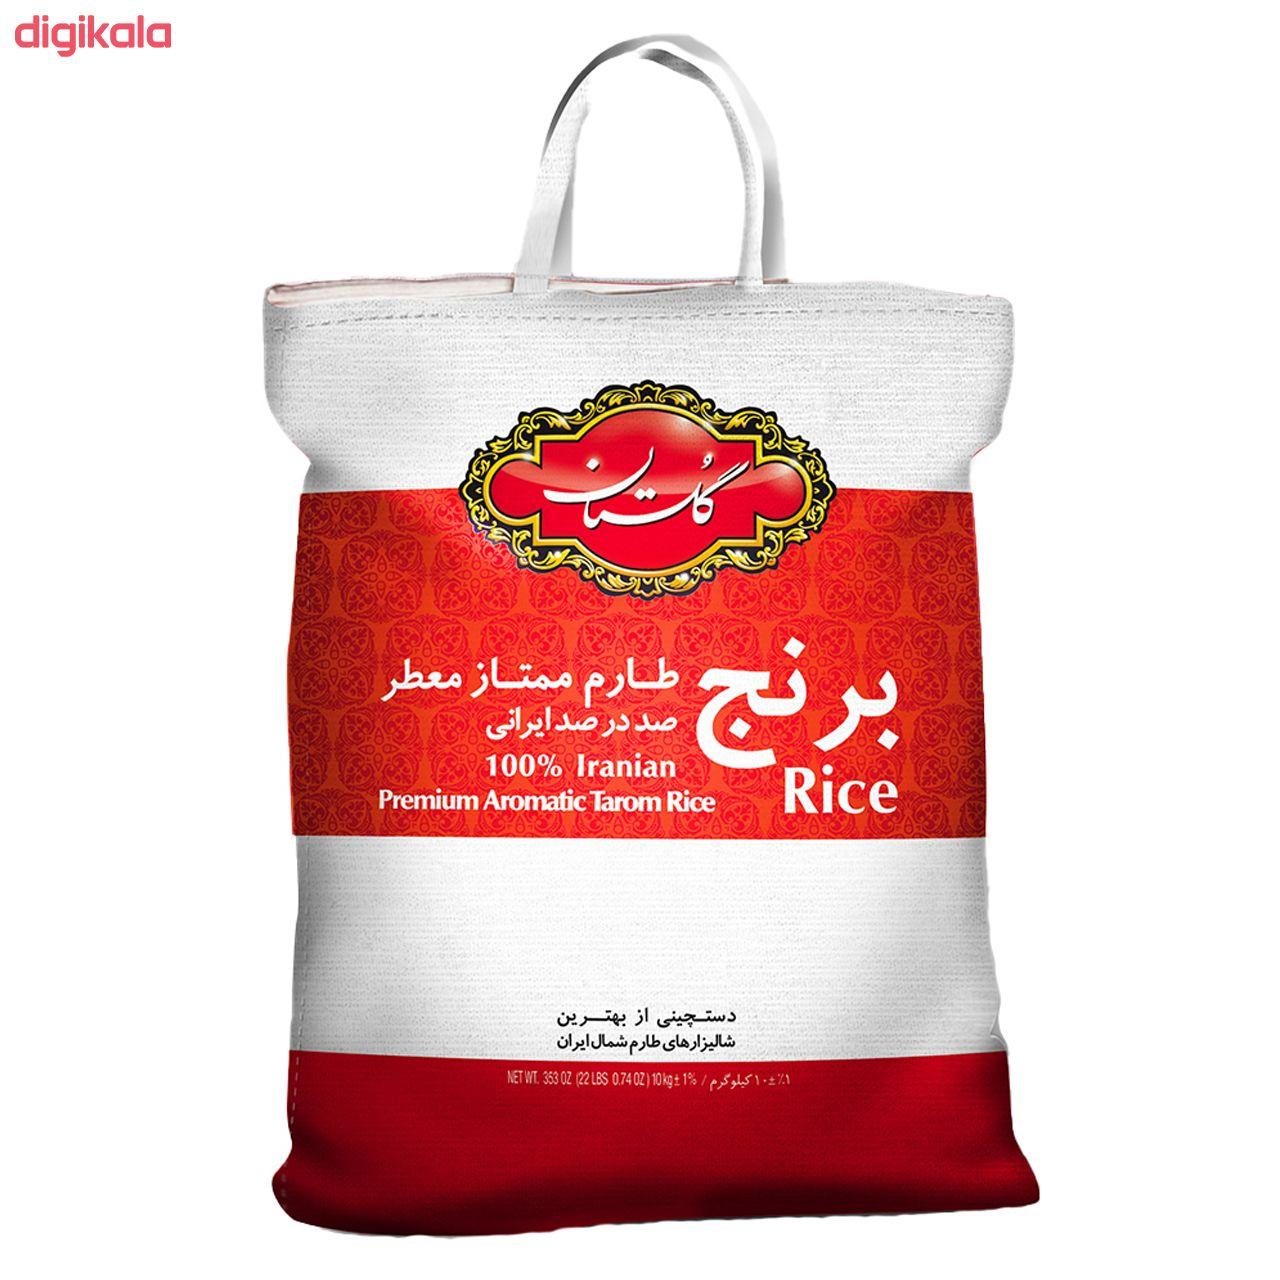 برنج طارم ممتاز گلستان وزن 10 کیلوگرم main 1 1